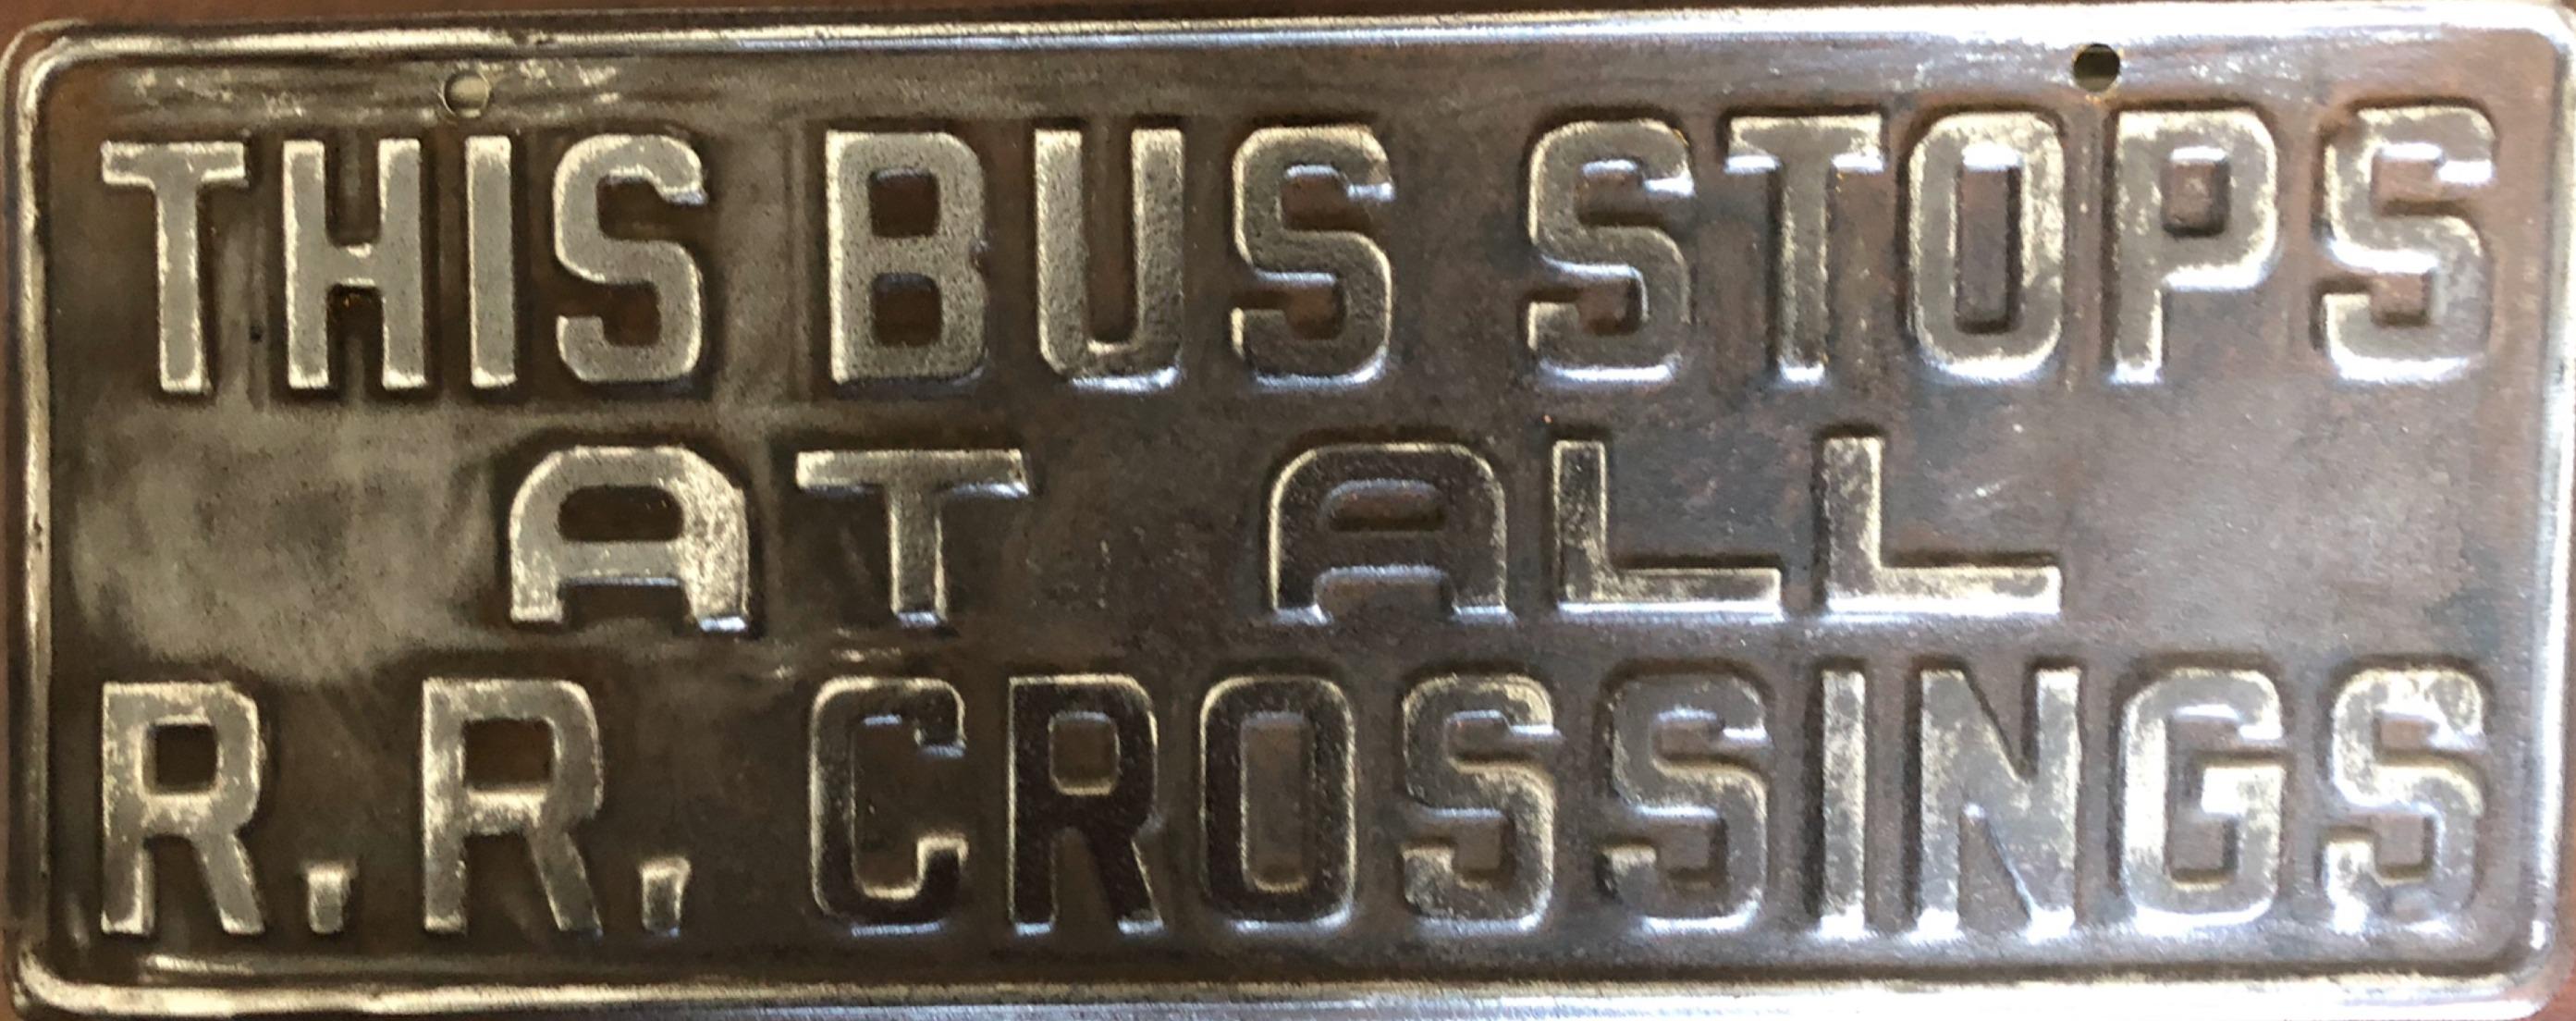 50s Bus Warning Sign